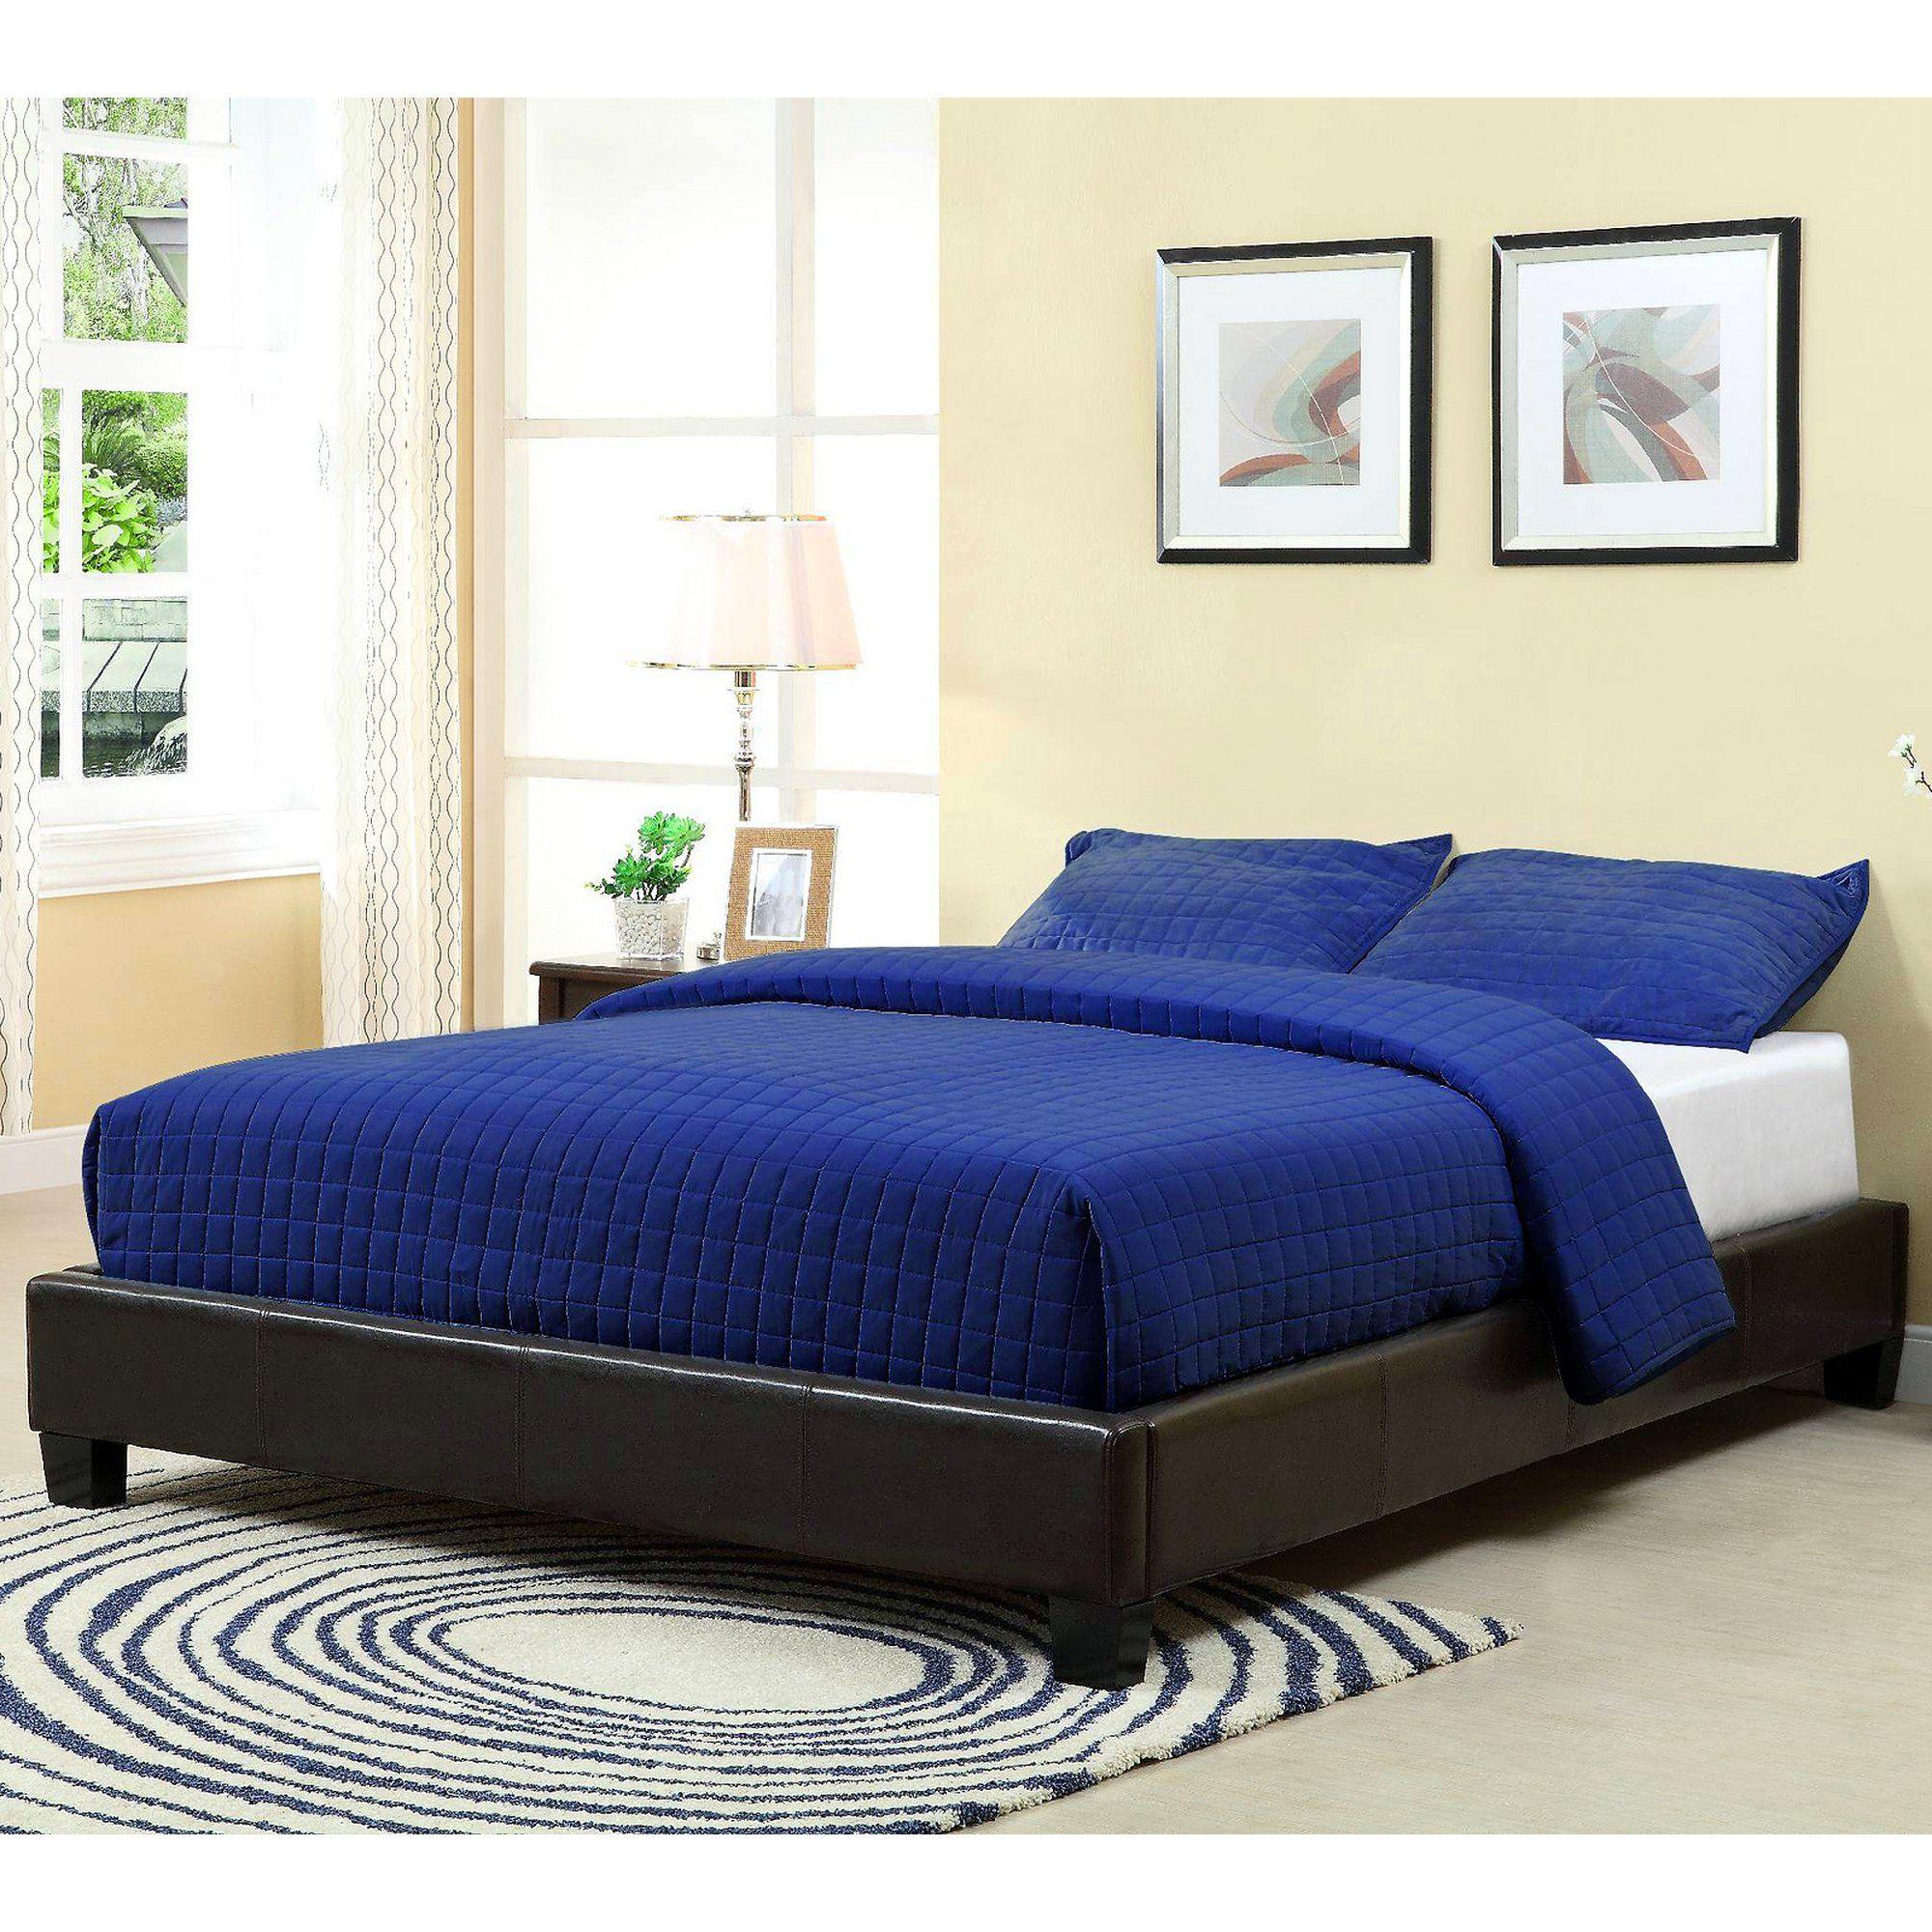 The Ledge Platform Bed  Moledg  Sleepys